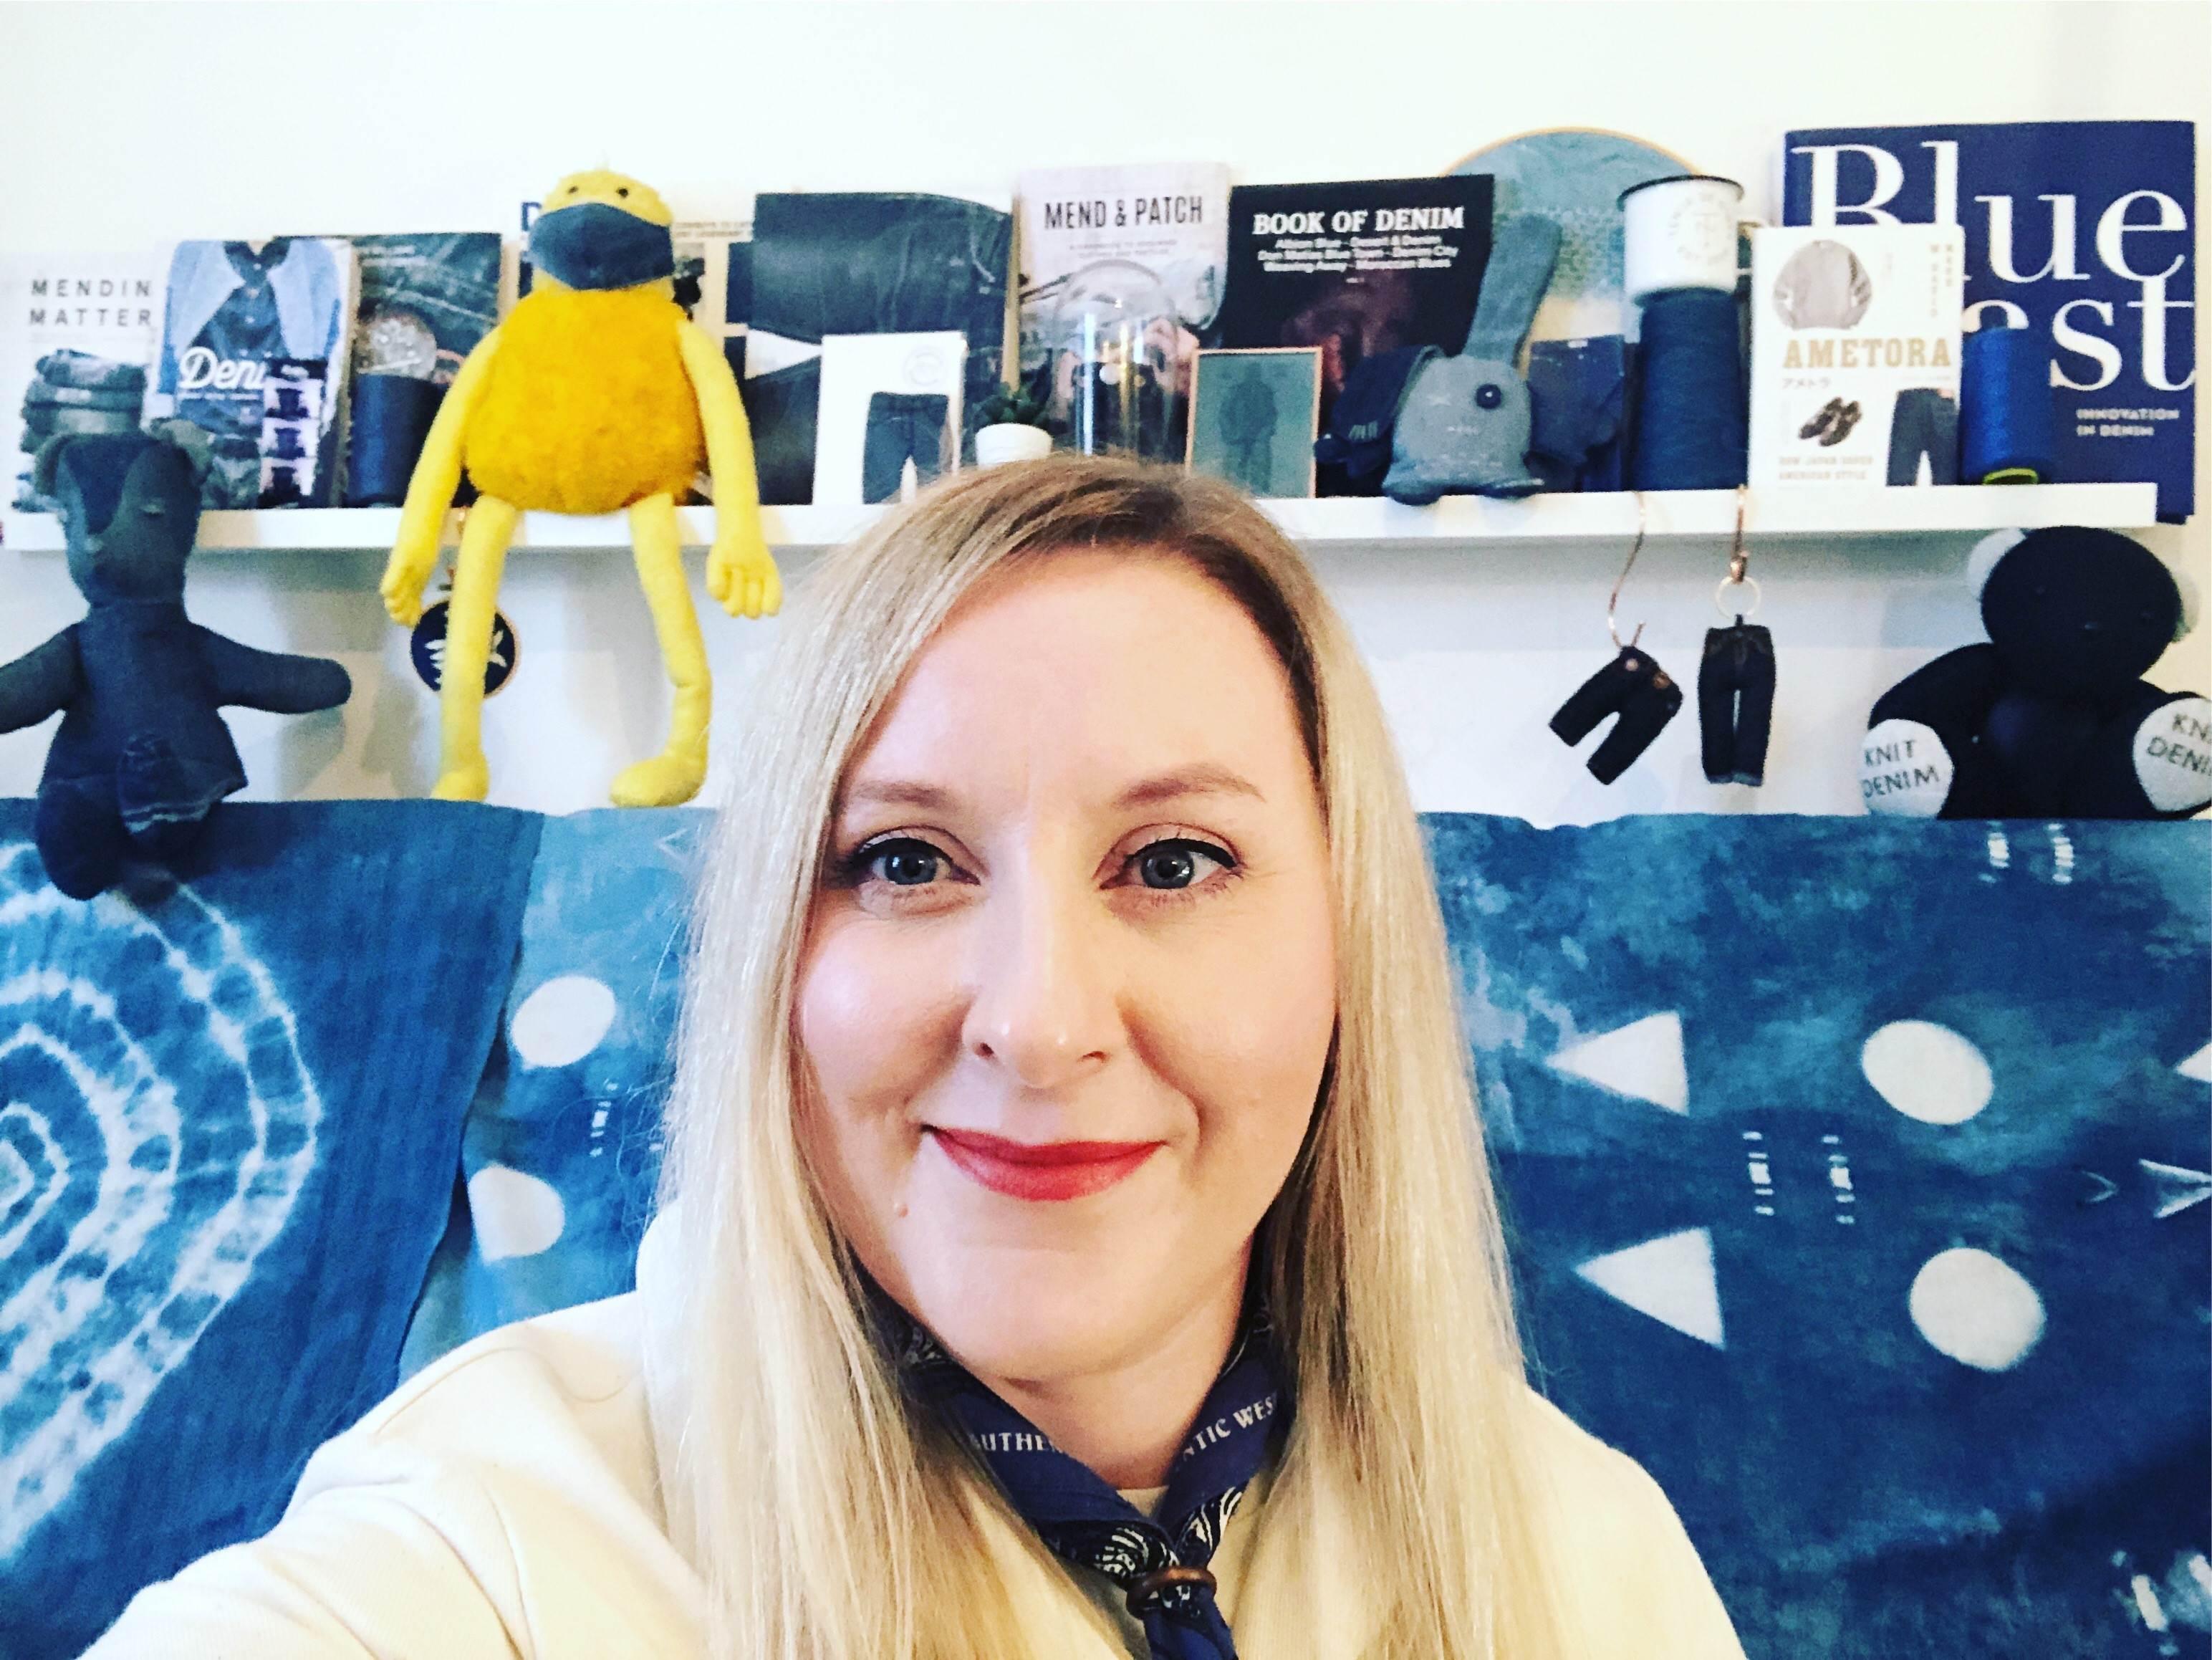 Amanda Barnes: Denim Hang is a global celebration of our community